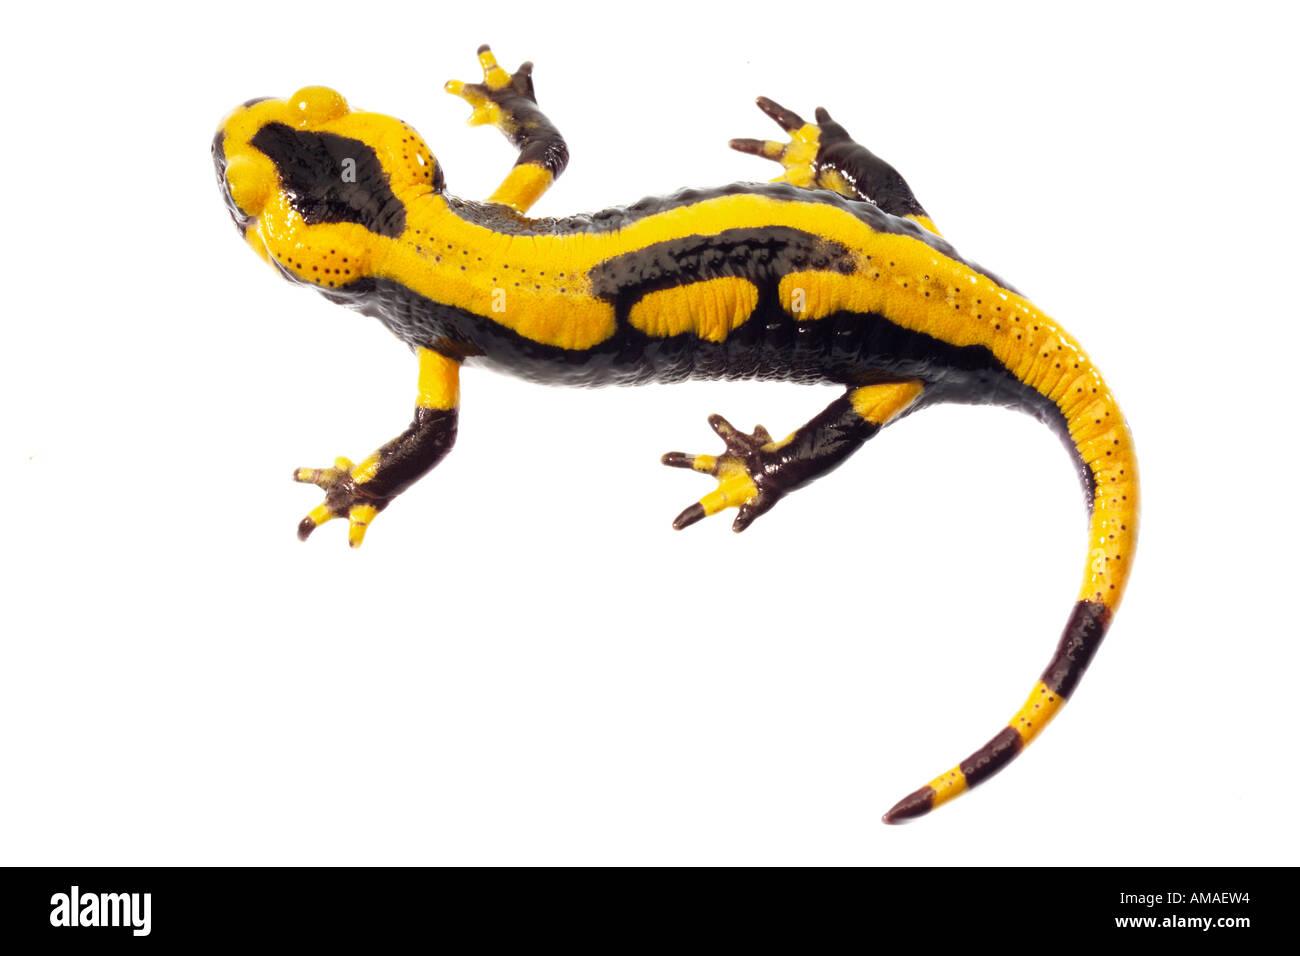 Salamandra pezzata Immagini Stock